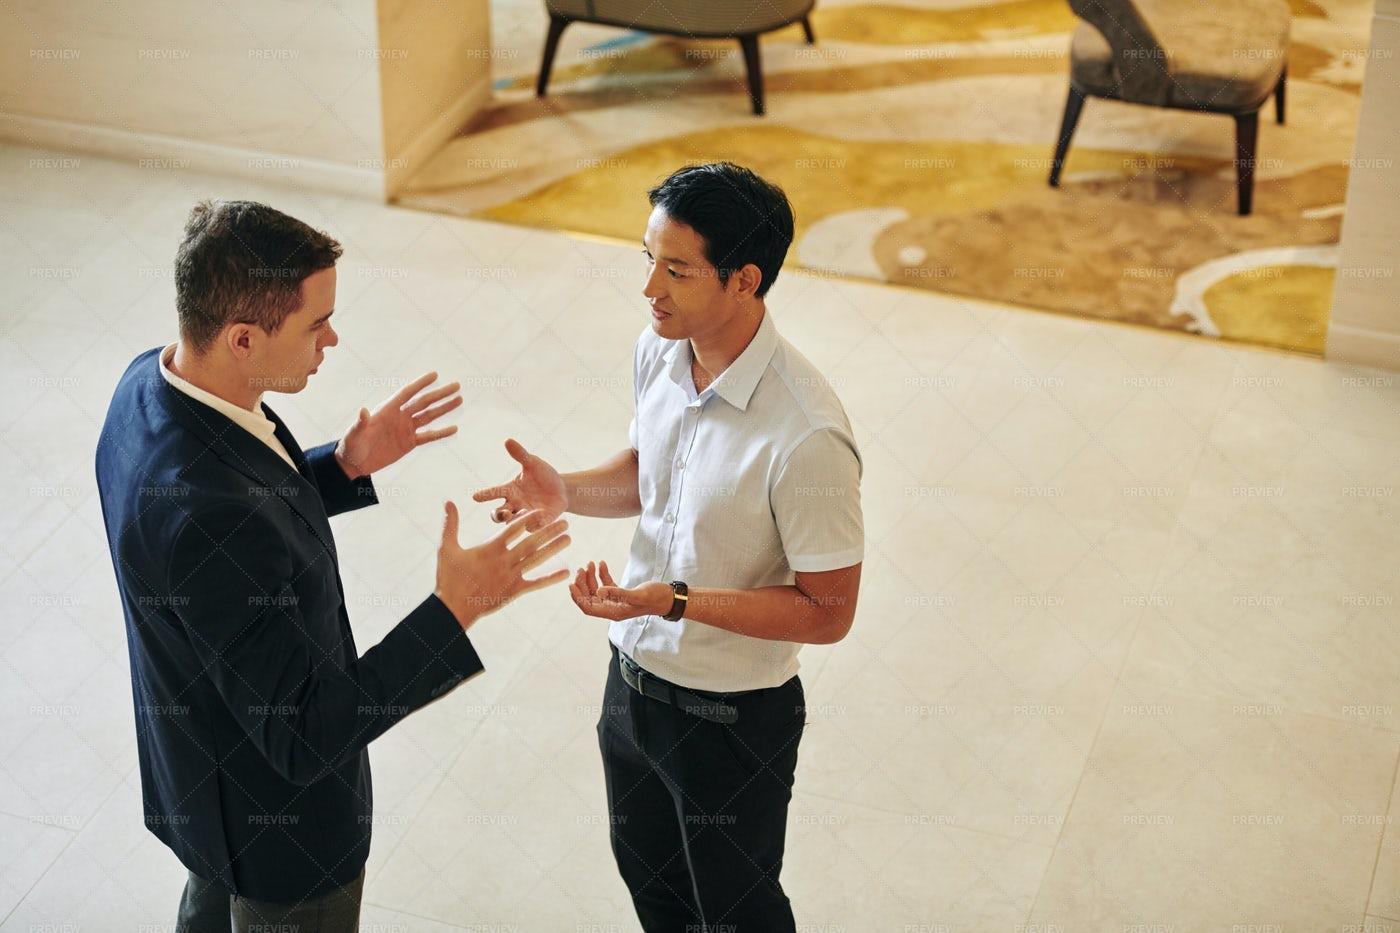 Talking Gesturing Business People: Stock Photos